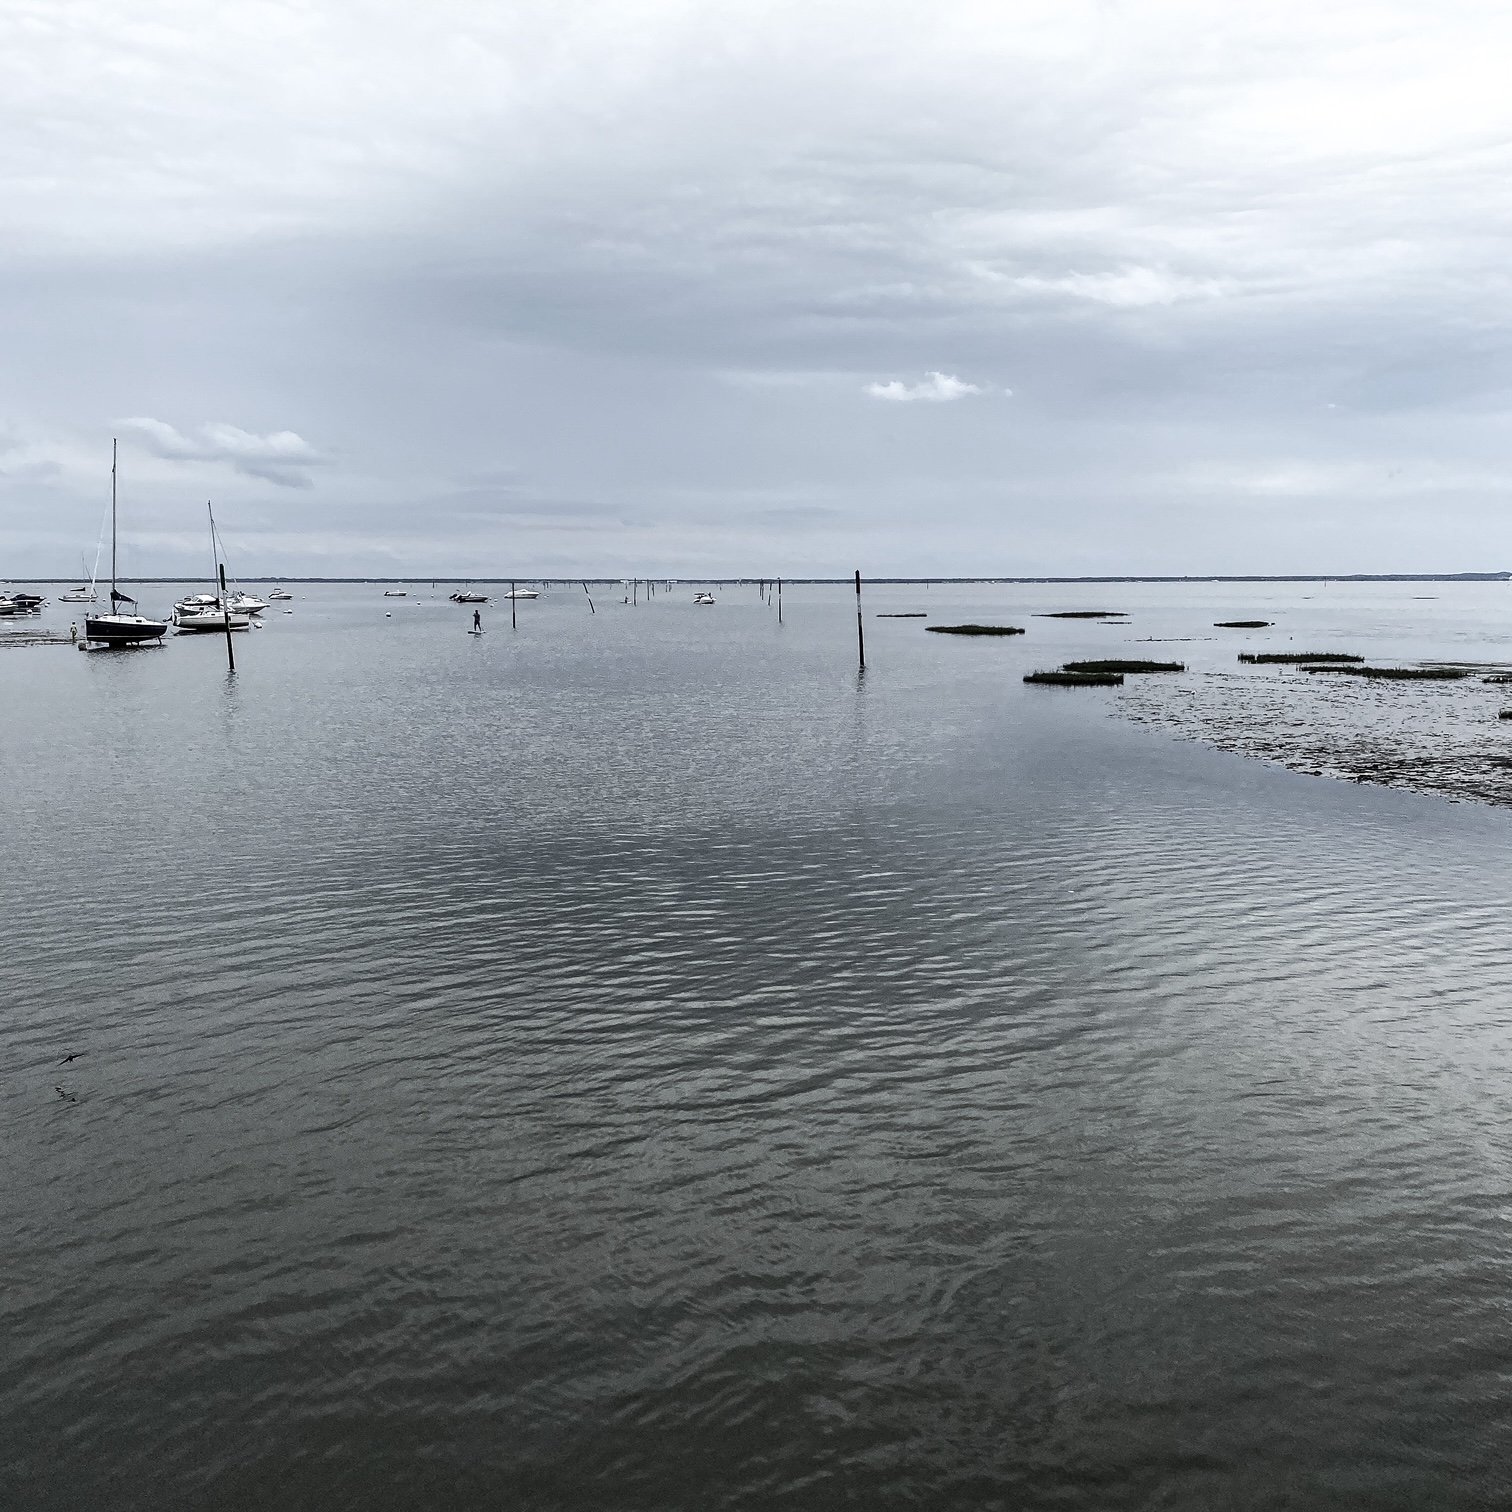 Bassin gris